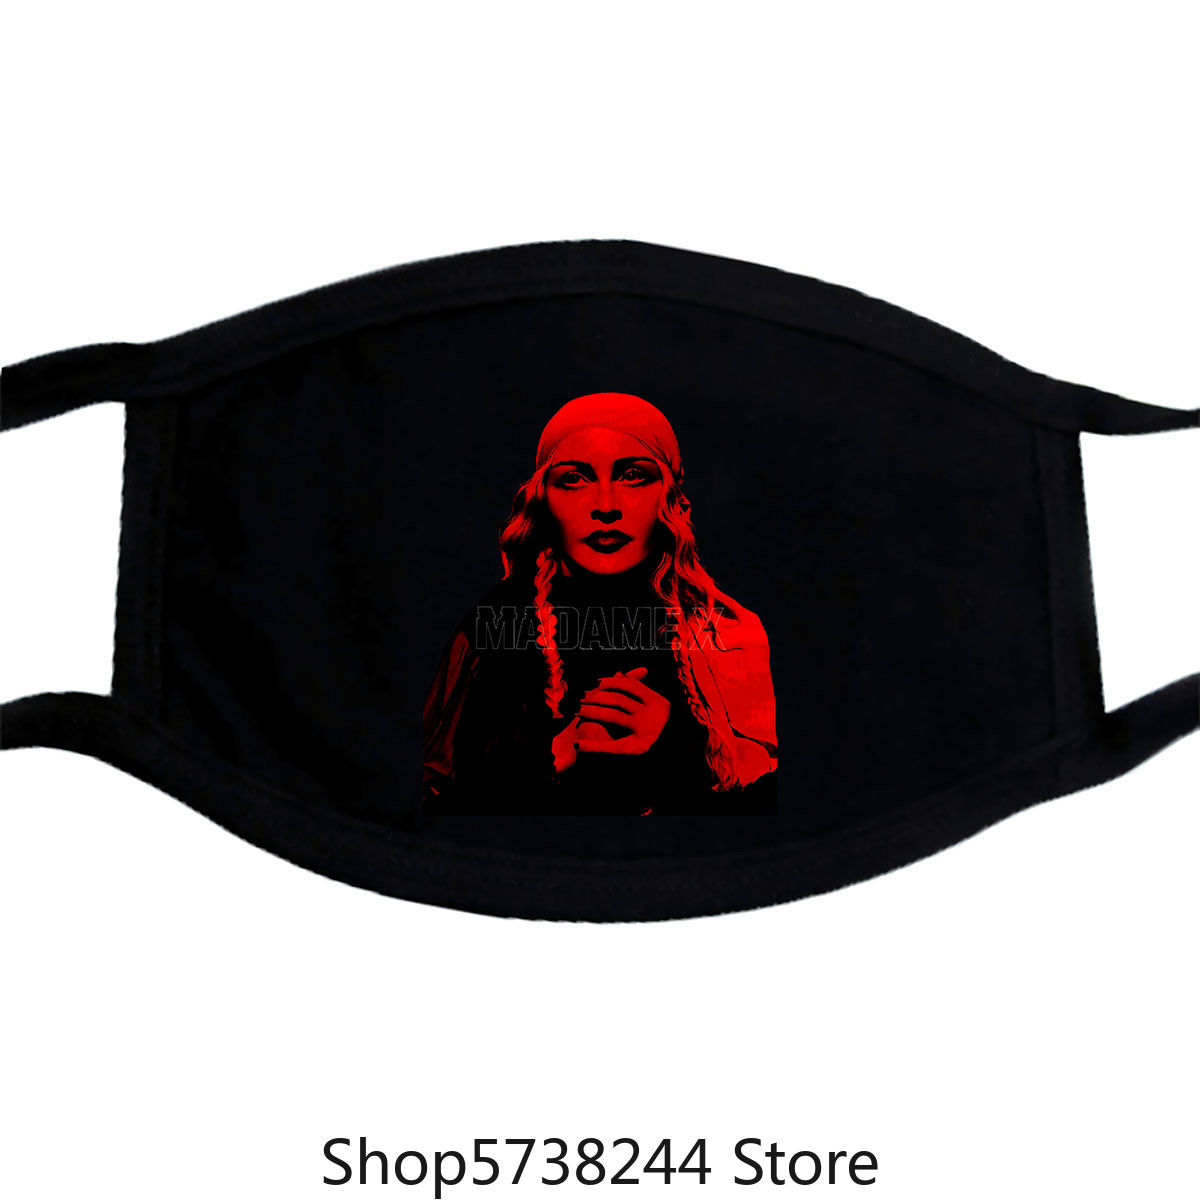 Madonna Madame X Tour Unisex Mask 2019 2020 Usa Size S 5Xl Washable Reusable Mask